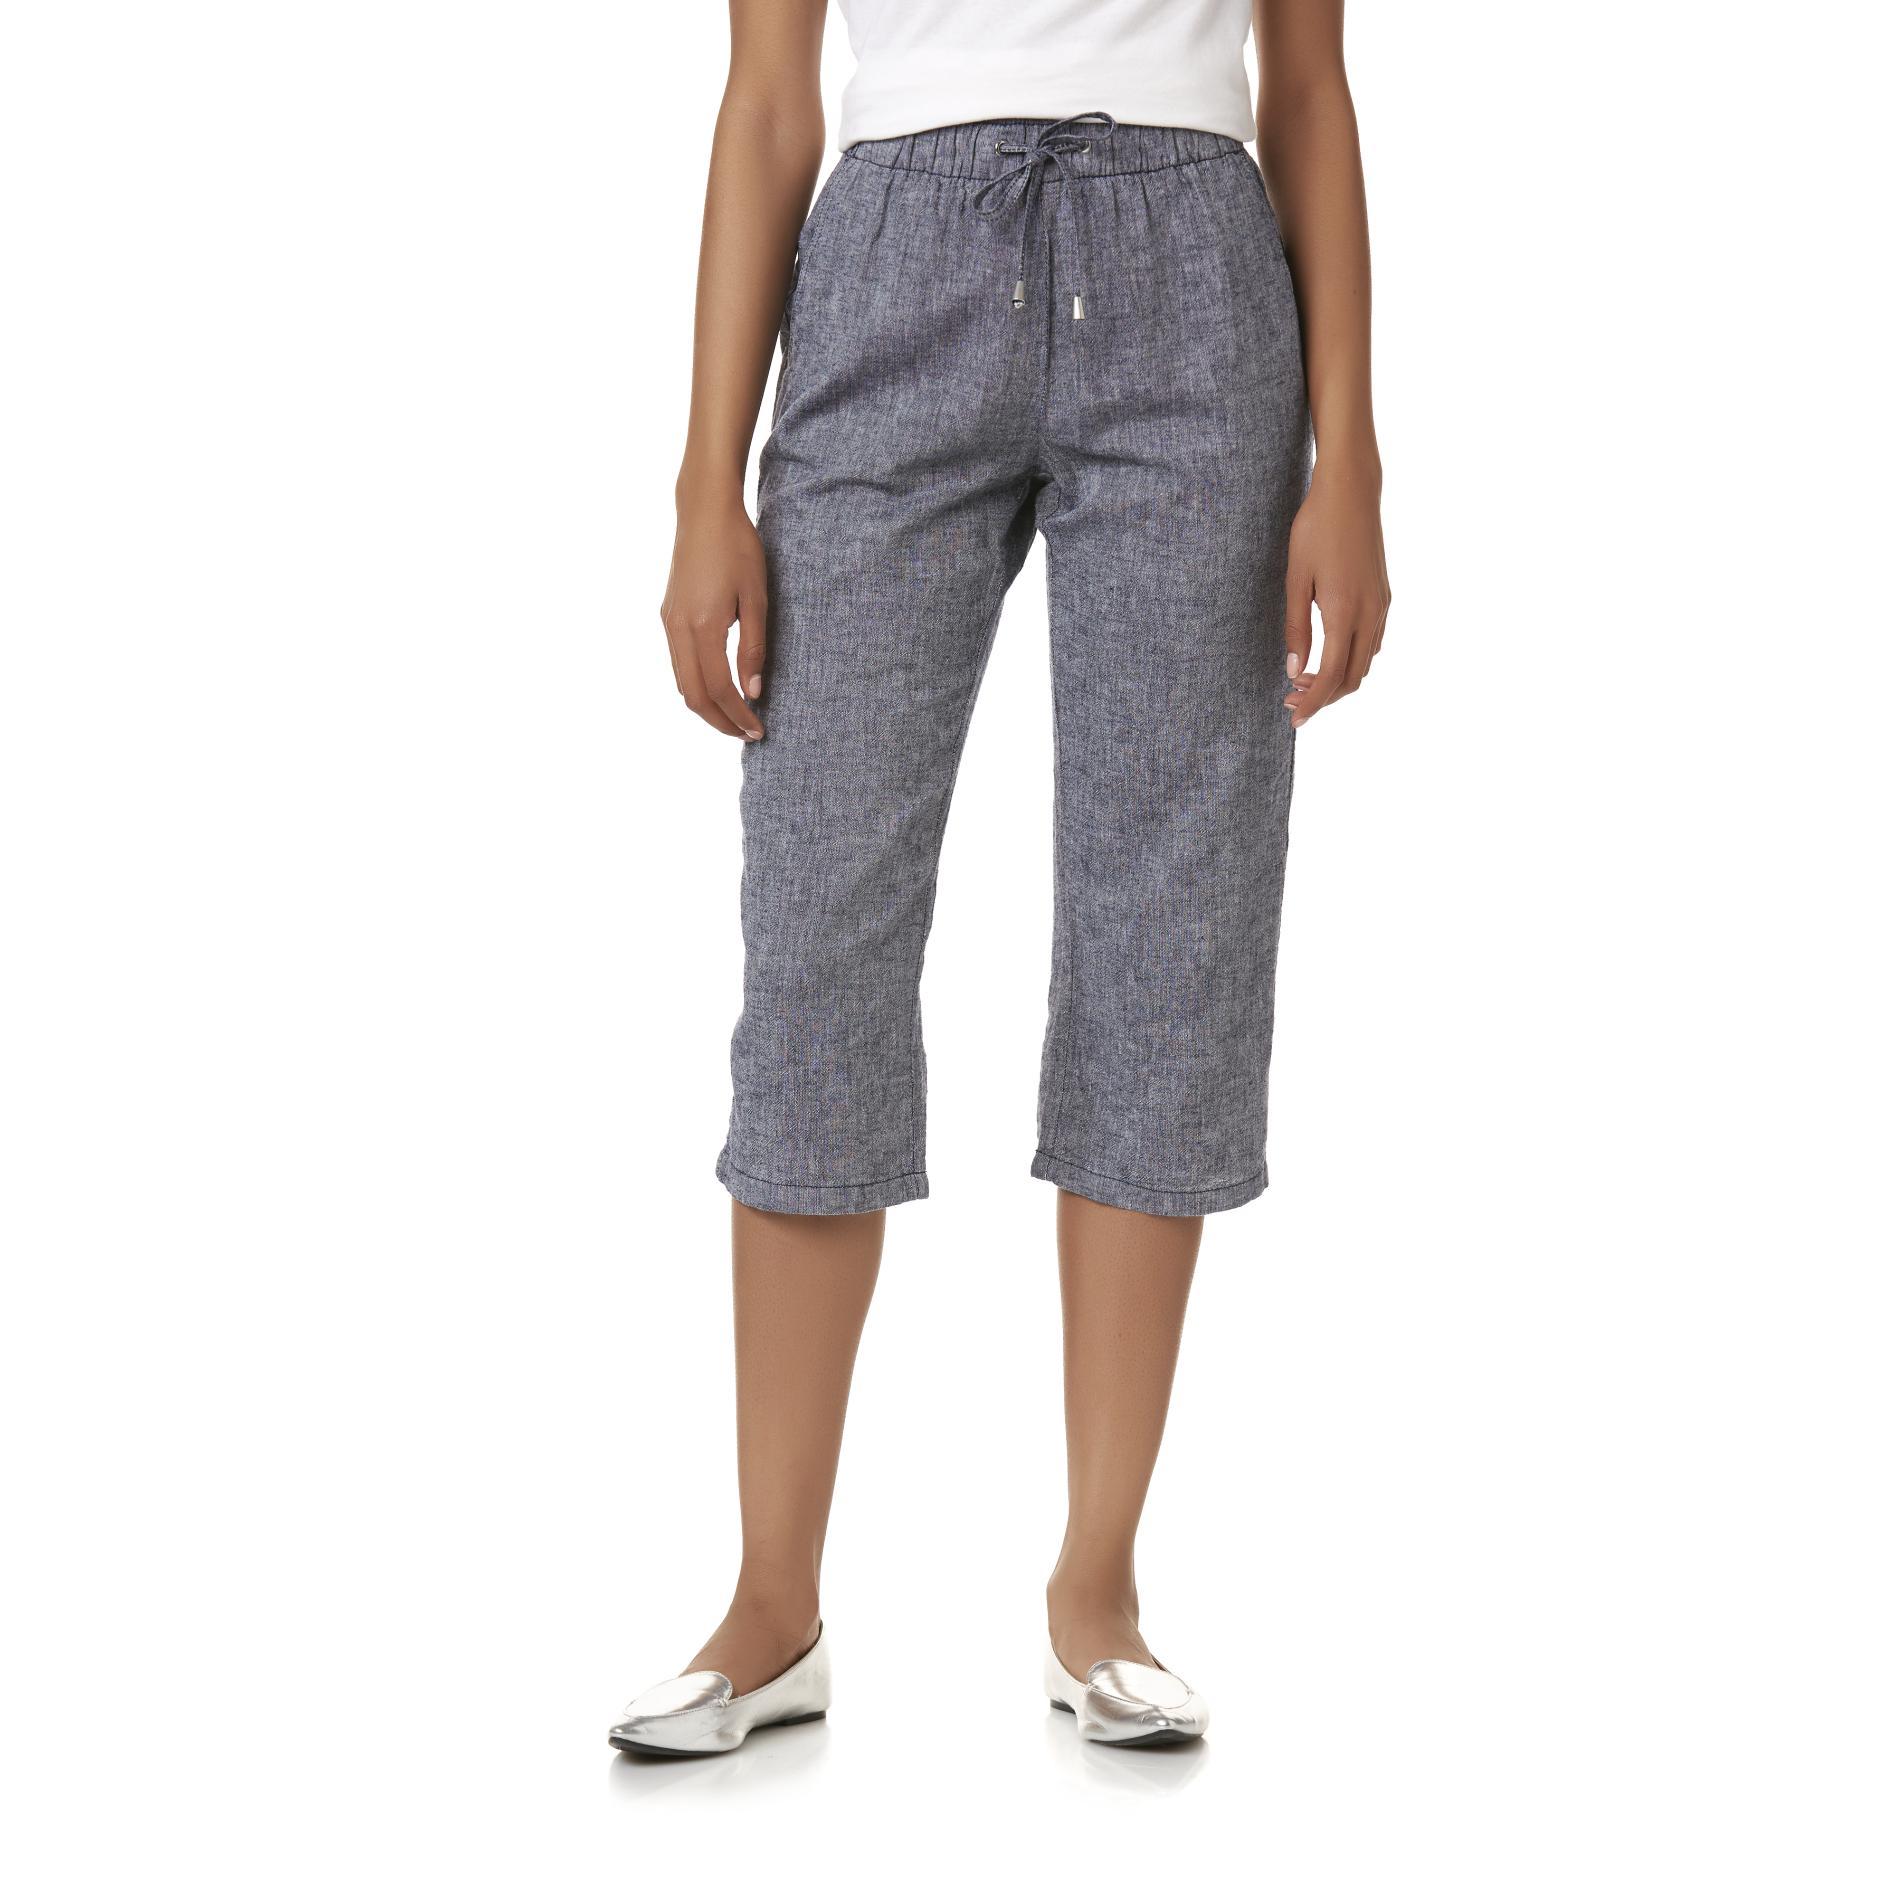 Basic Editions Women' Drawstring Capri Pants - Heathered